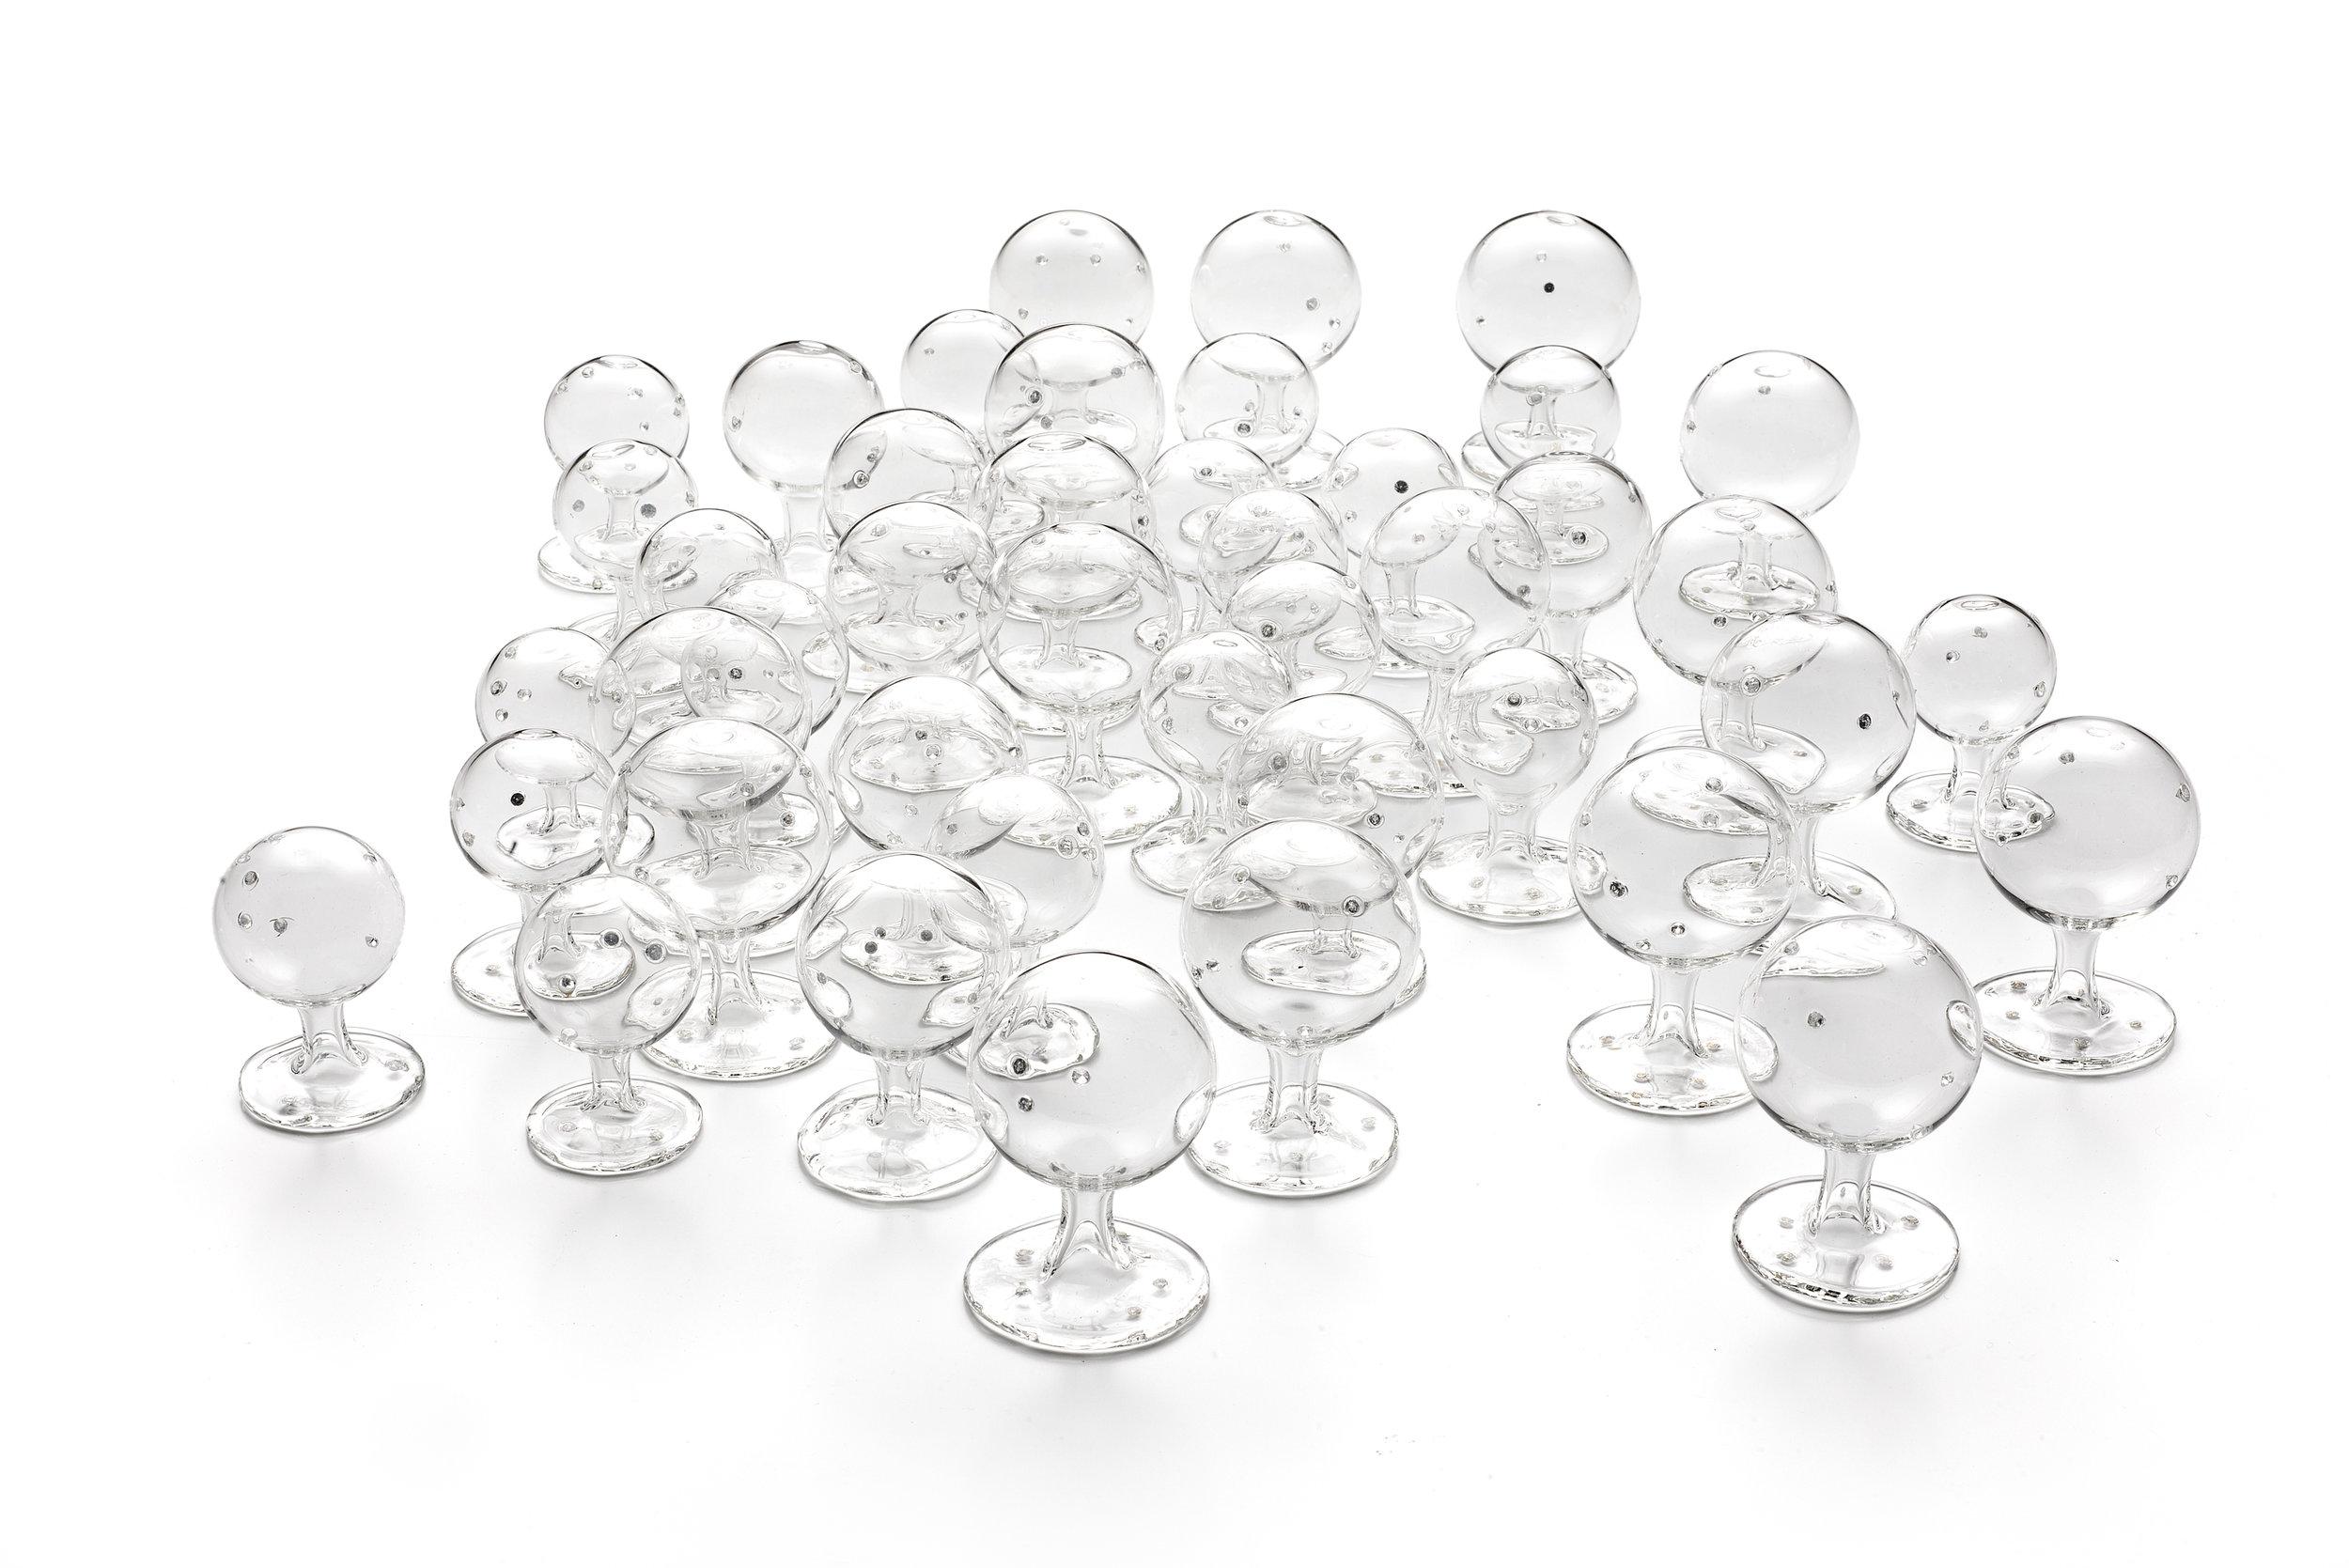 Federica Sala, Junk Diamonds, rings, photo: Federico Cavicchioli